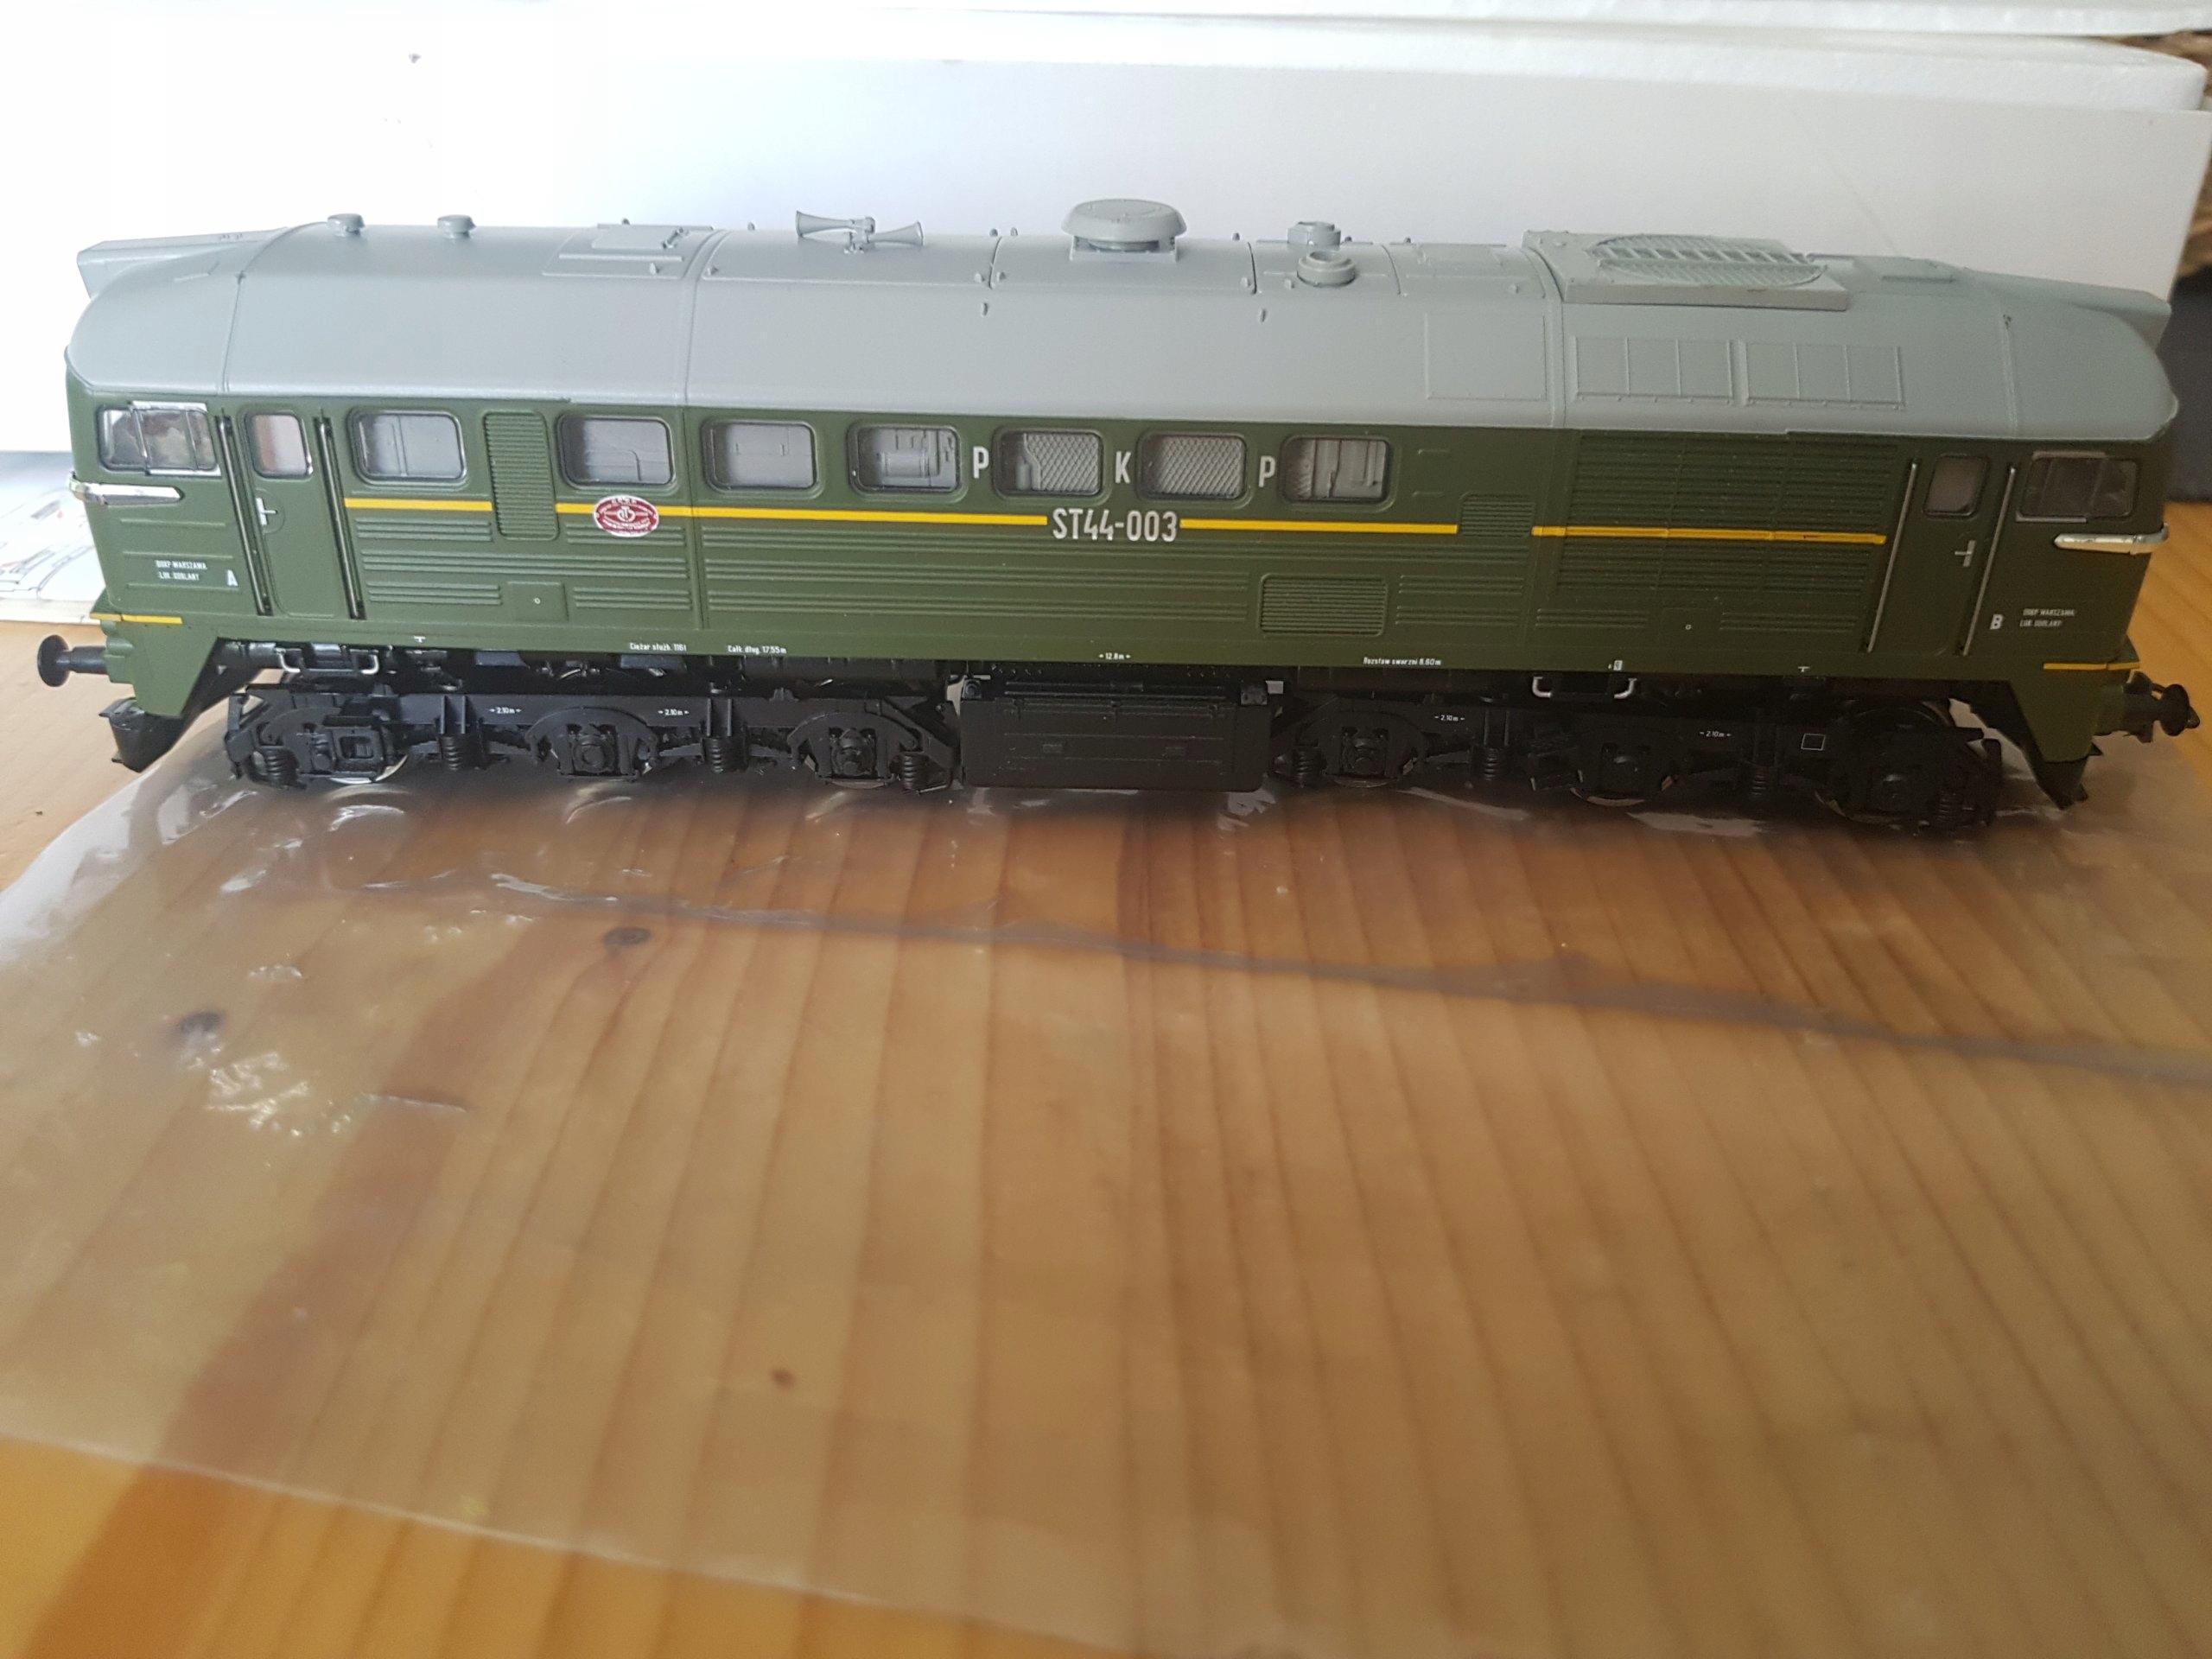 ST 44 003 Roco 62782